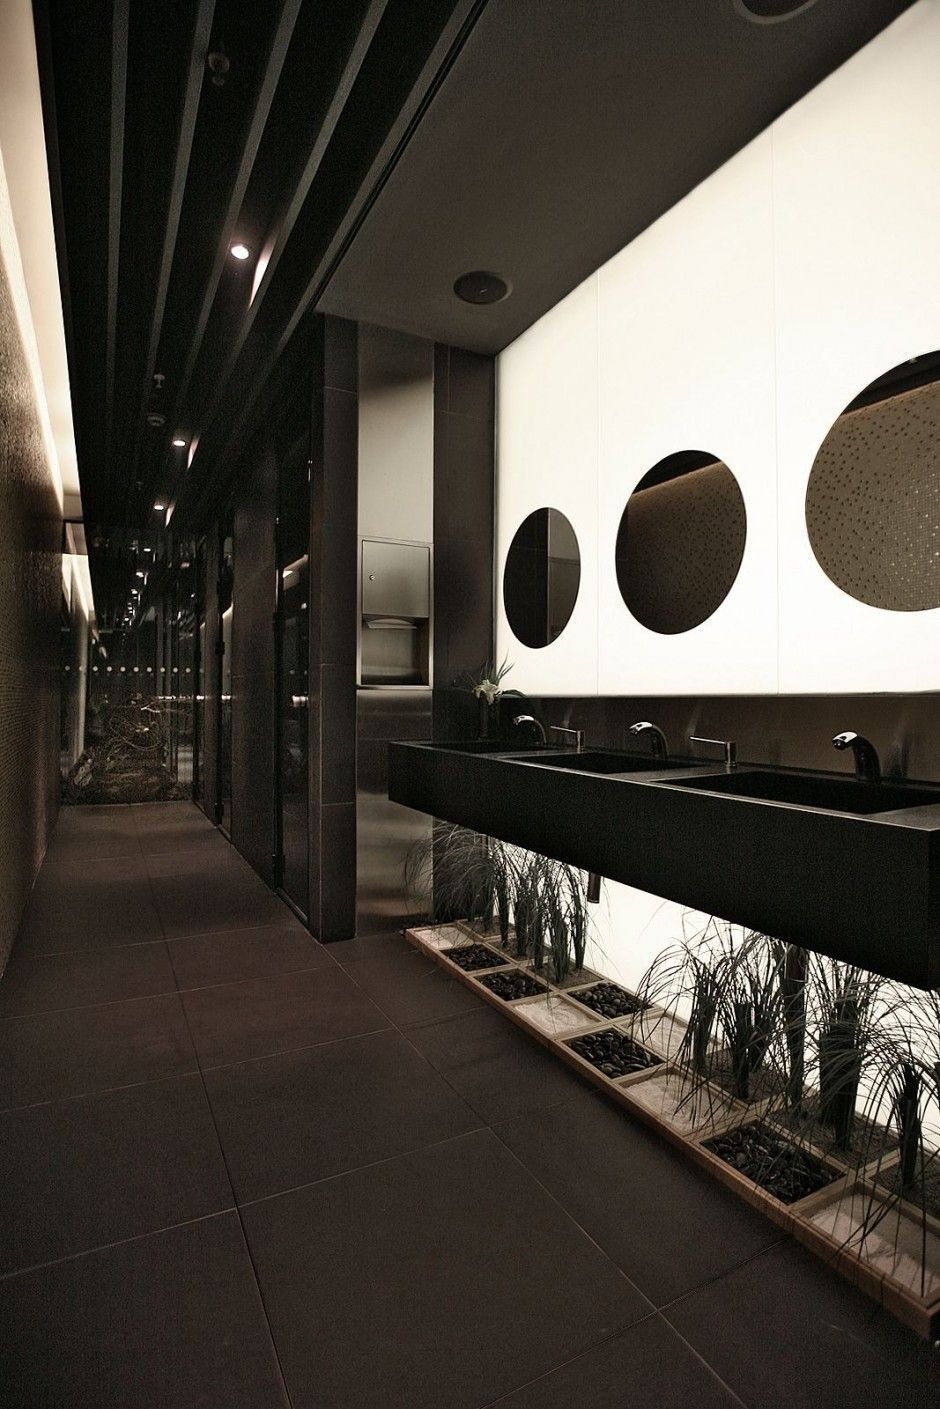 Radisson Hotel Lobby   By: Tanju Ozelginv Great Design